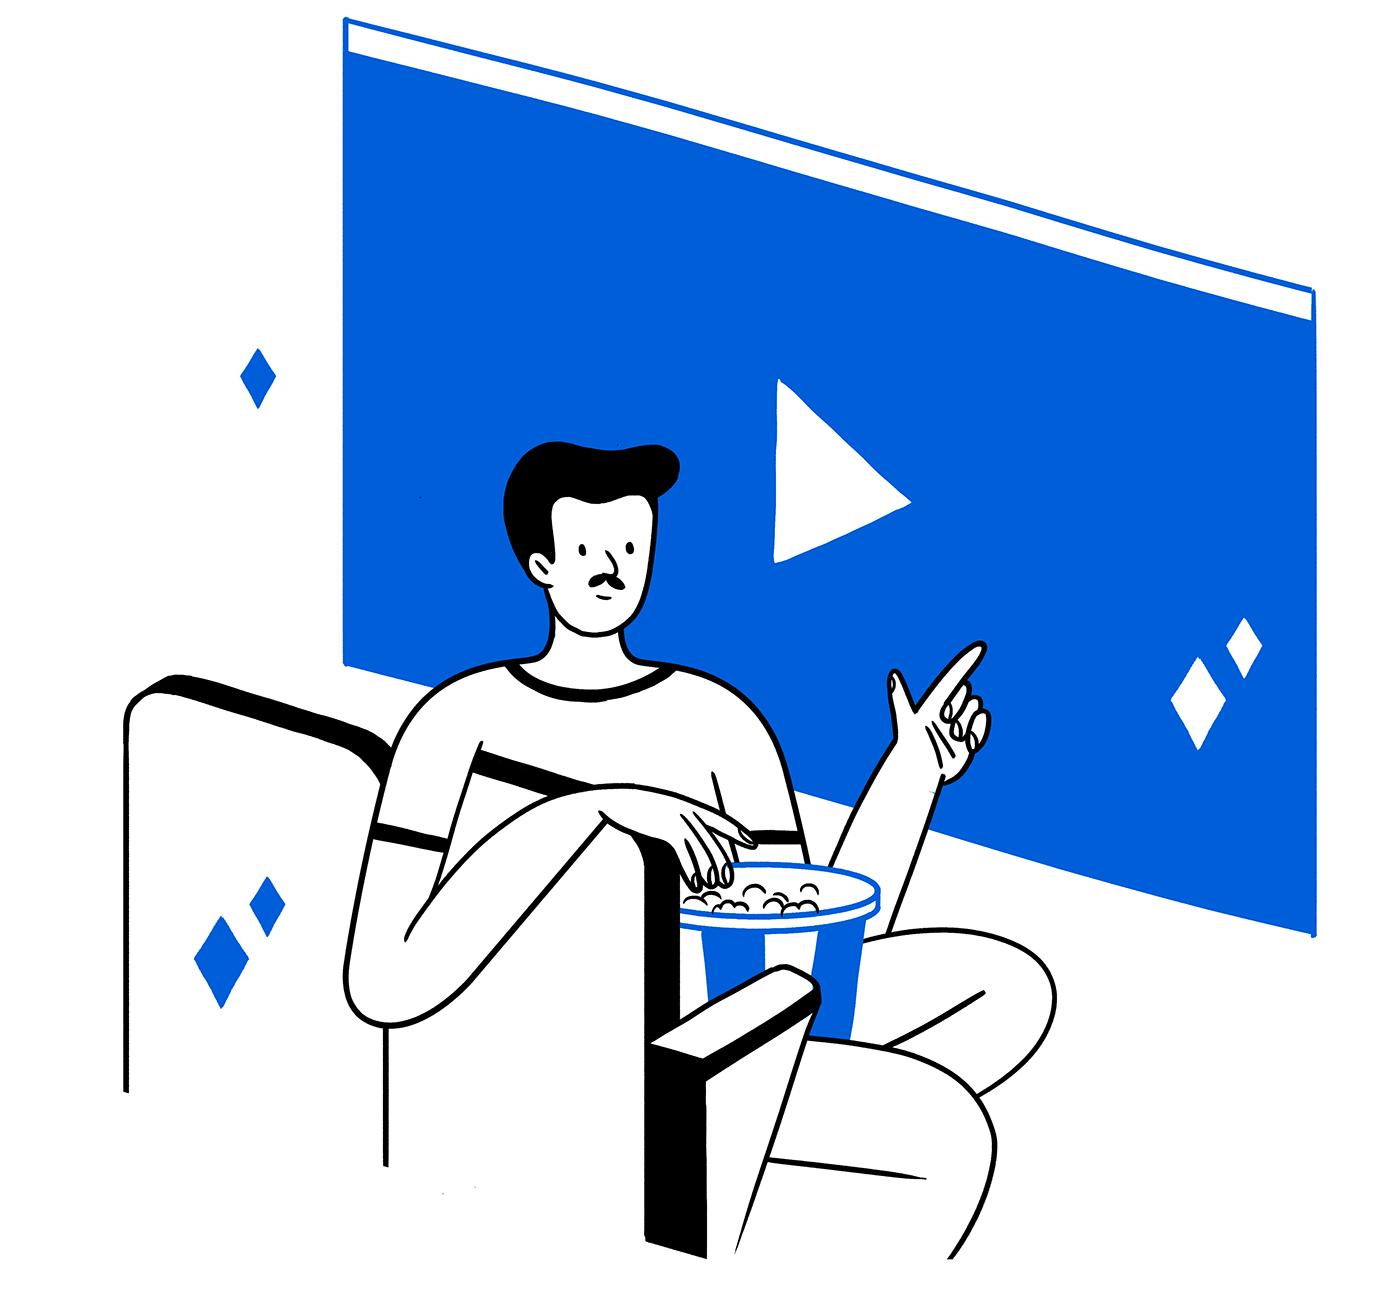 ILLUSTRATION  design ux UI characters graphicdesign brandidentity Webdesign art Drawing